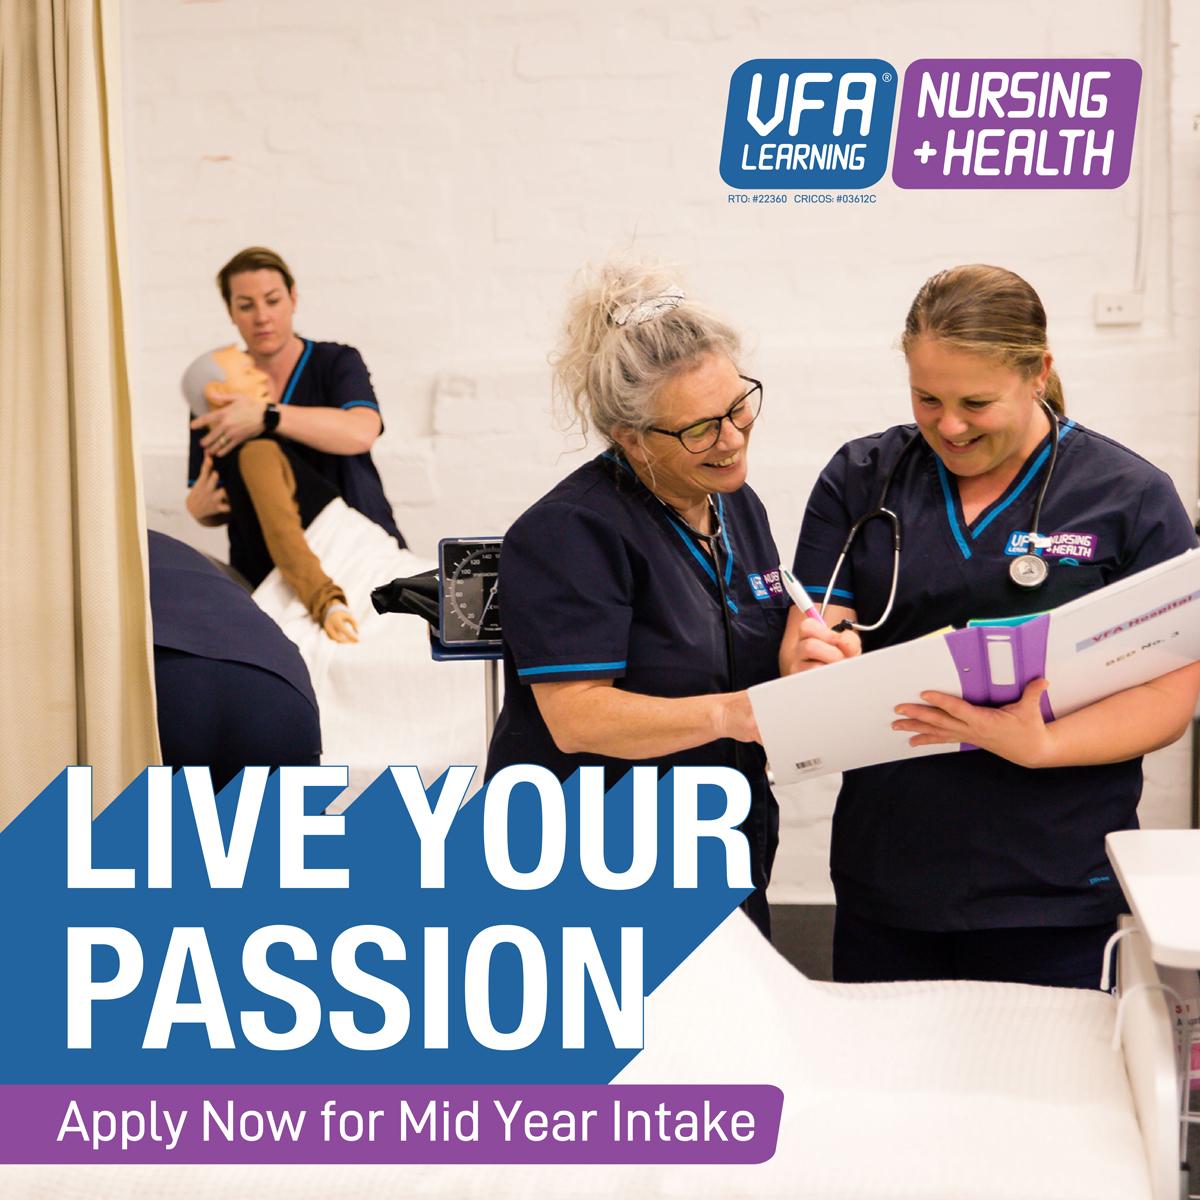 VFA Learning -Nursing_Instagram-copy.jpg